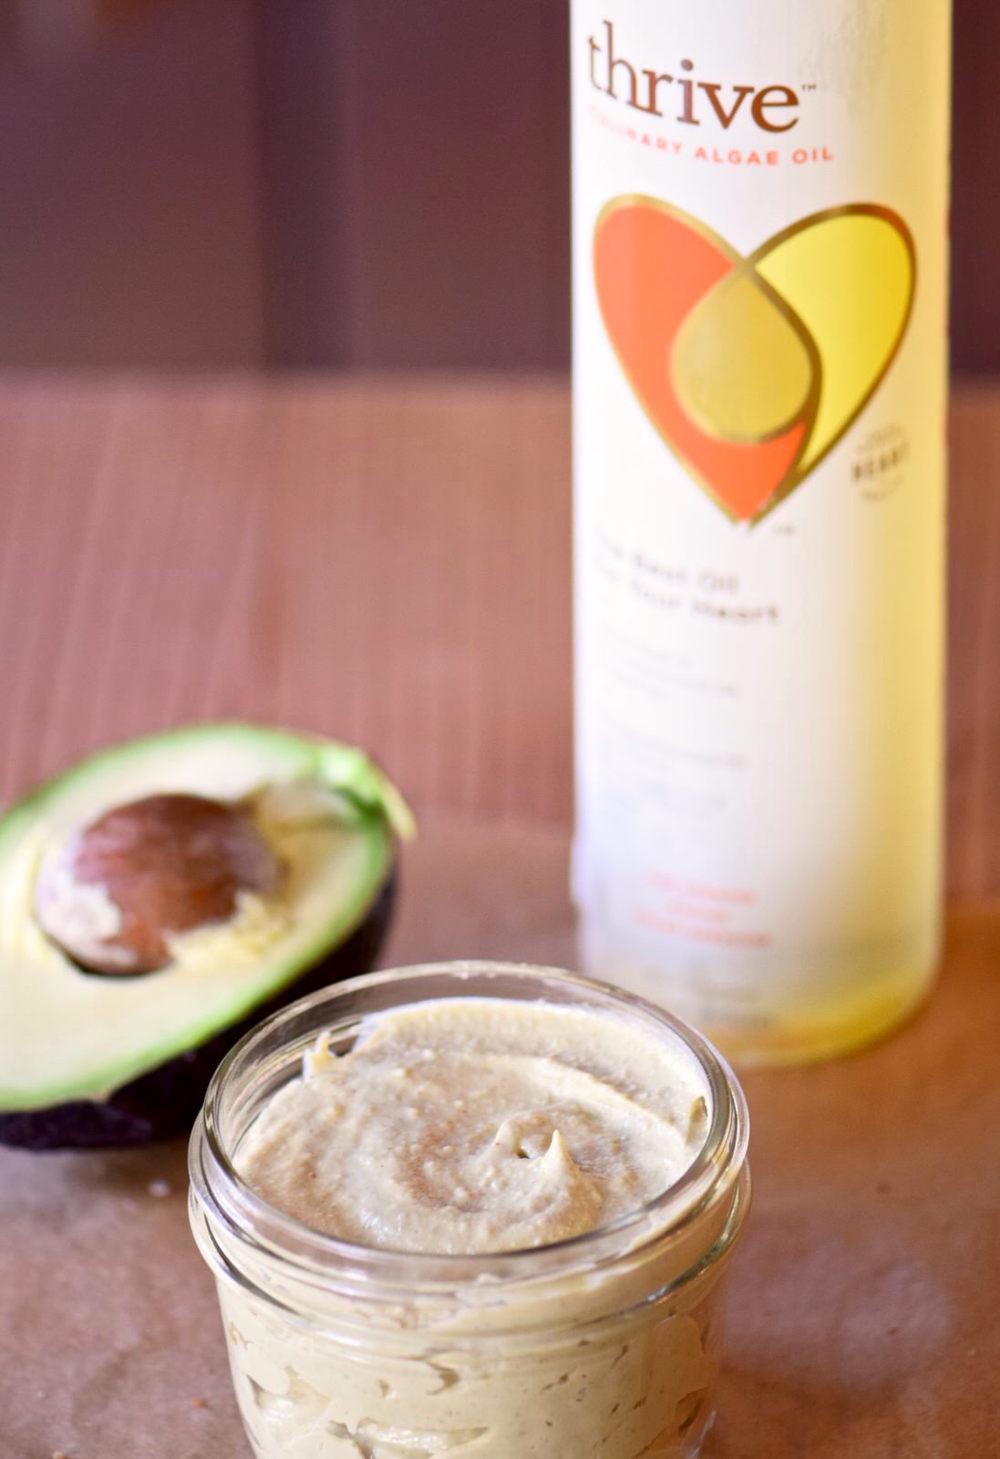 Avocado Tahini Sauce with Thrive Algae Oil